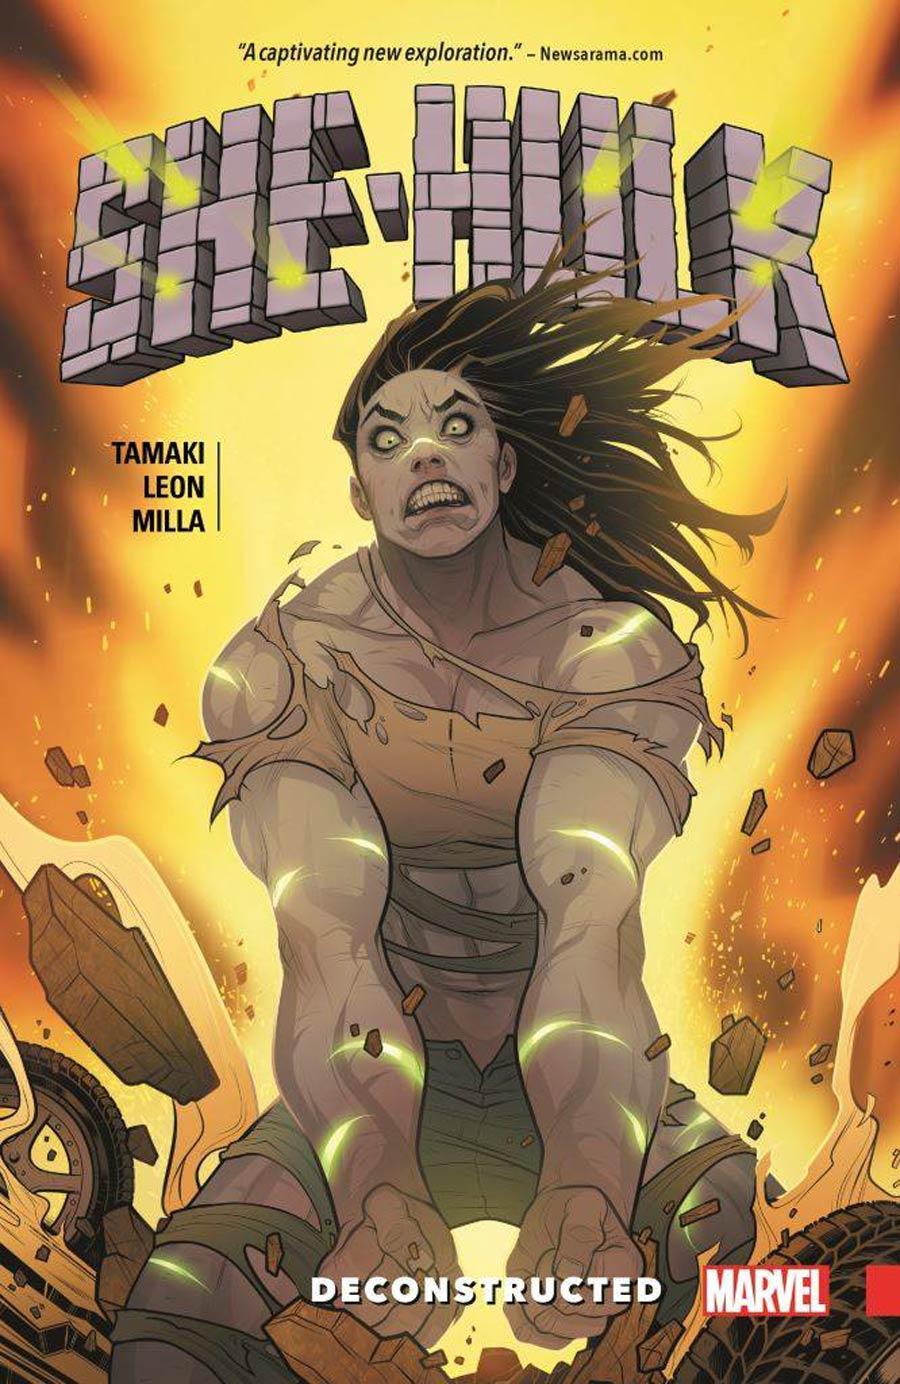 She-Hulk (2016) Vol 1 Deconstructed TP